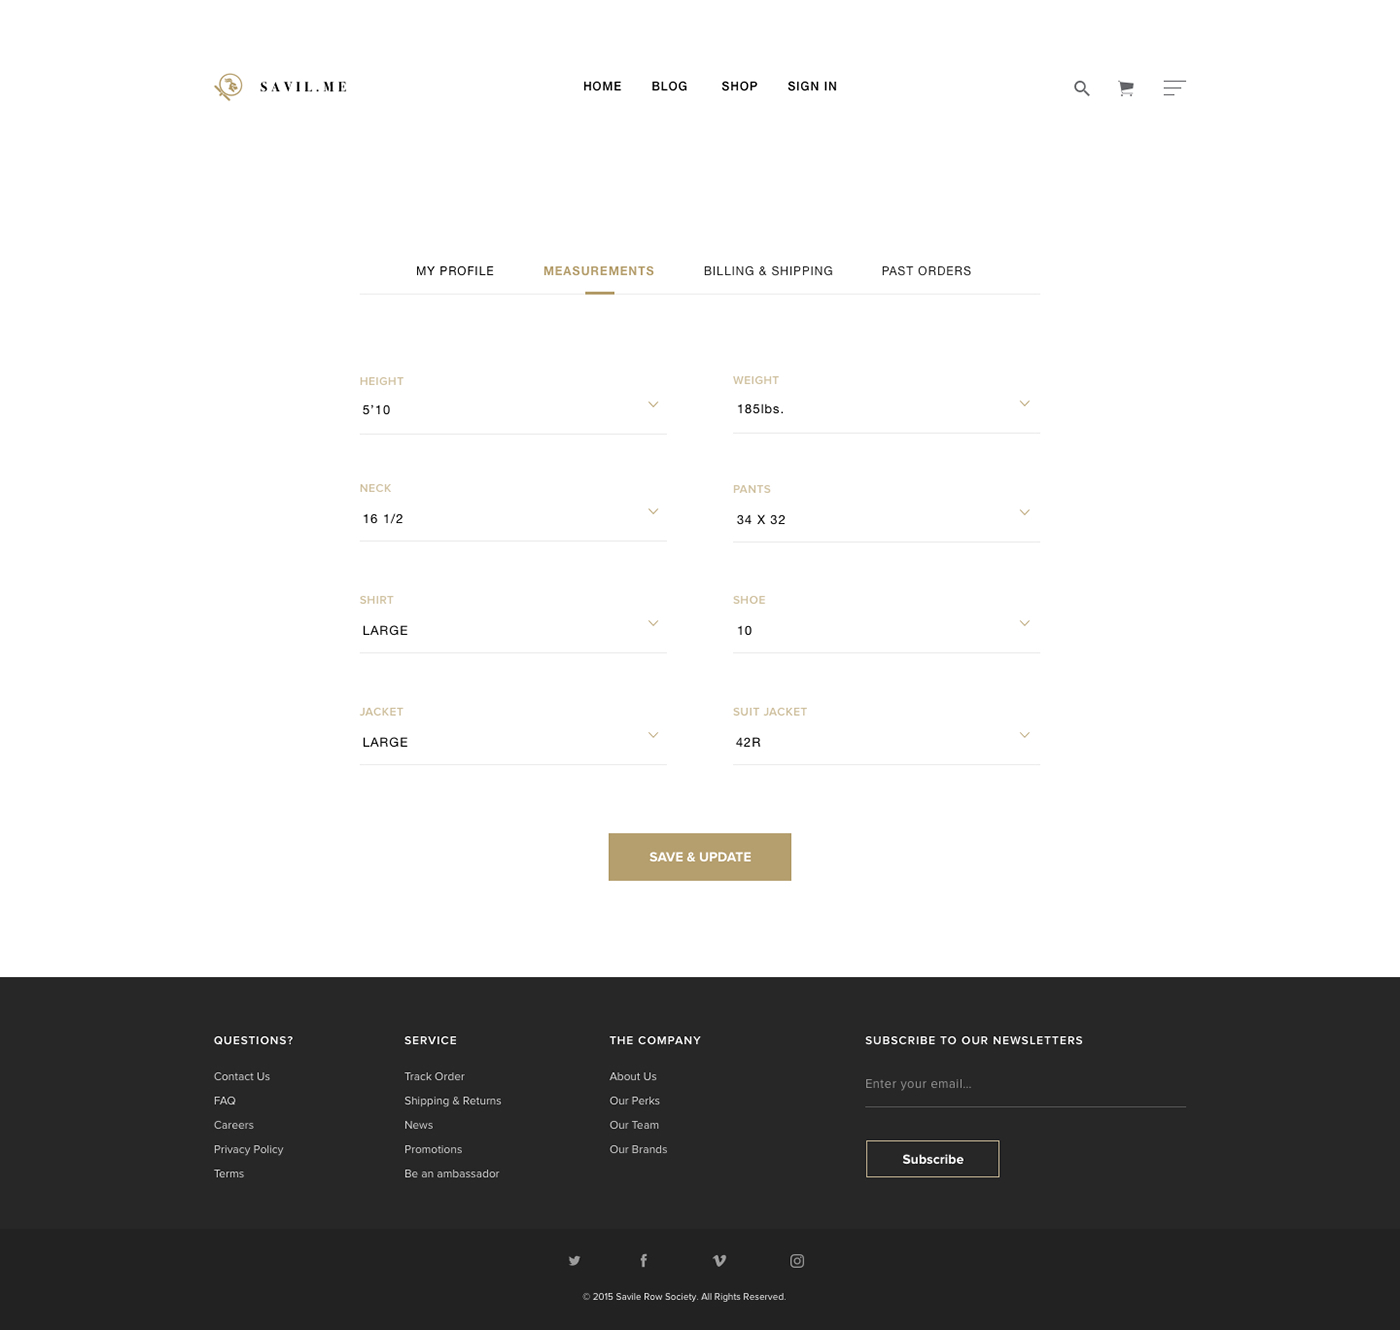 Ecommerce user experience luxury Clothing e-commerce Website modern